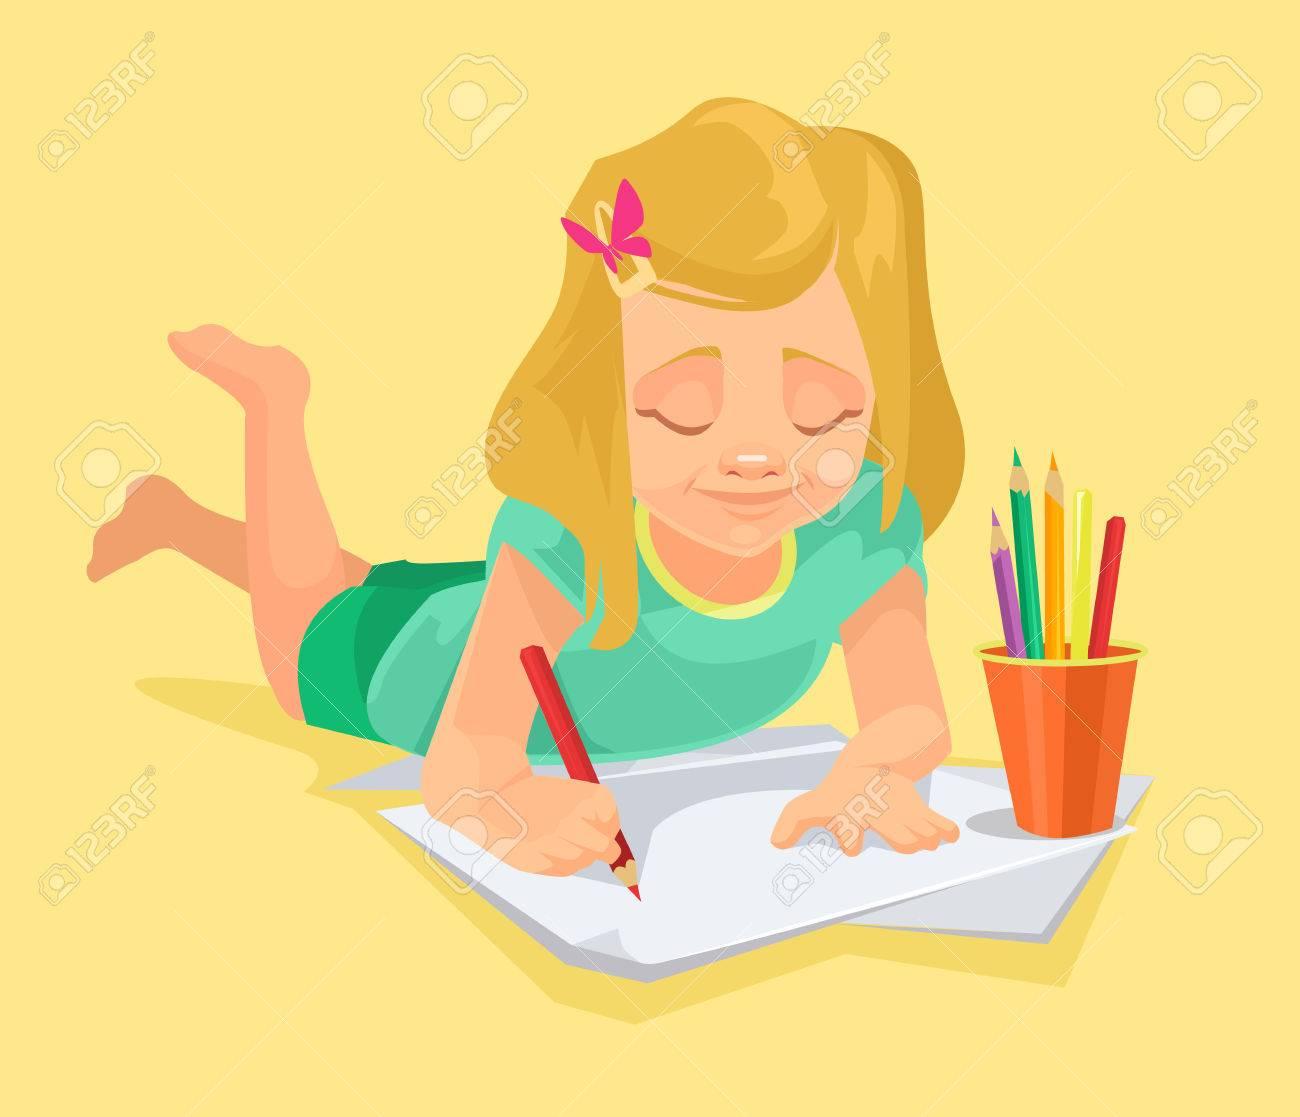 Draw clipart girl draw. Drawn little cartoon x